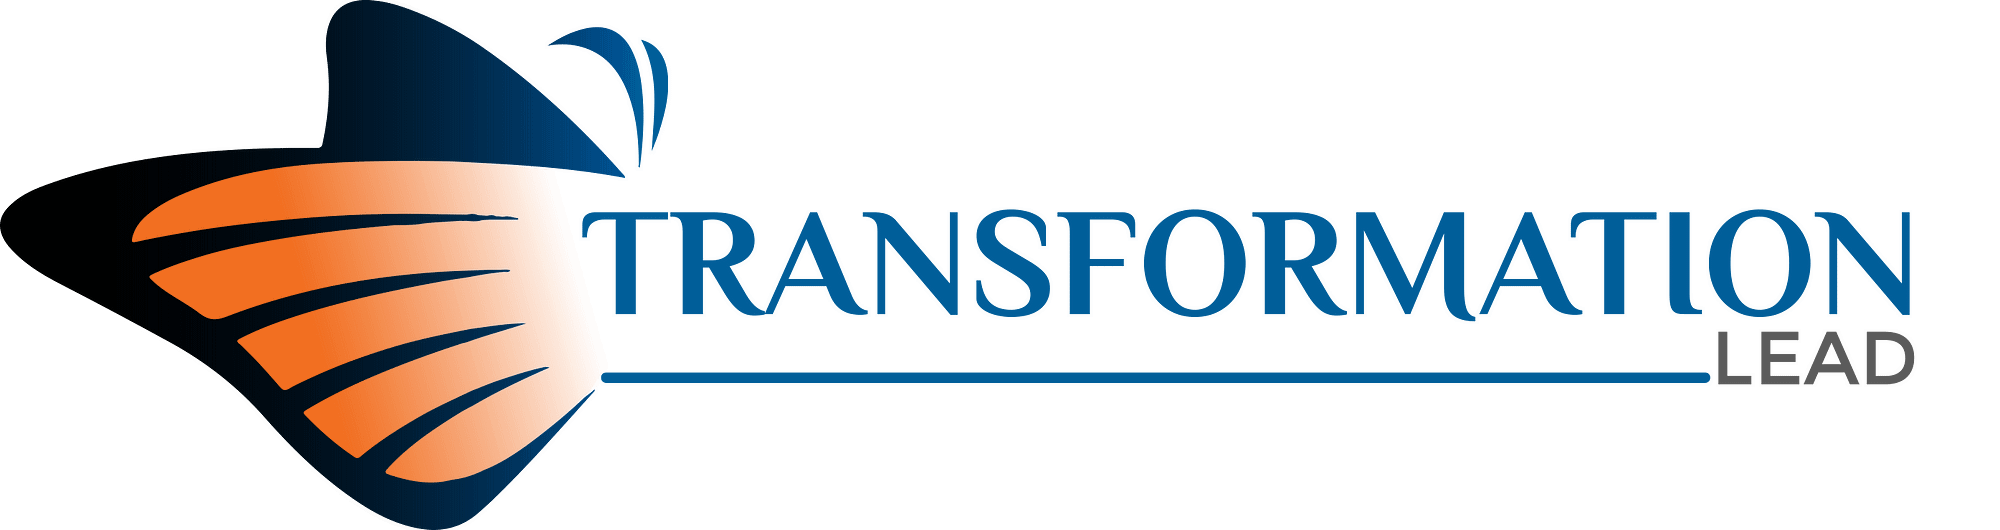 TransformationLead